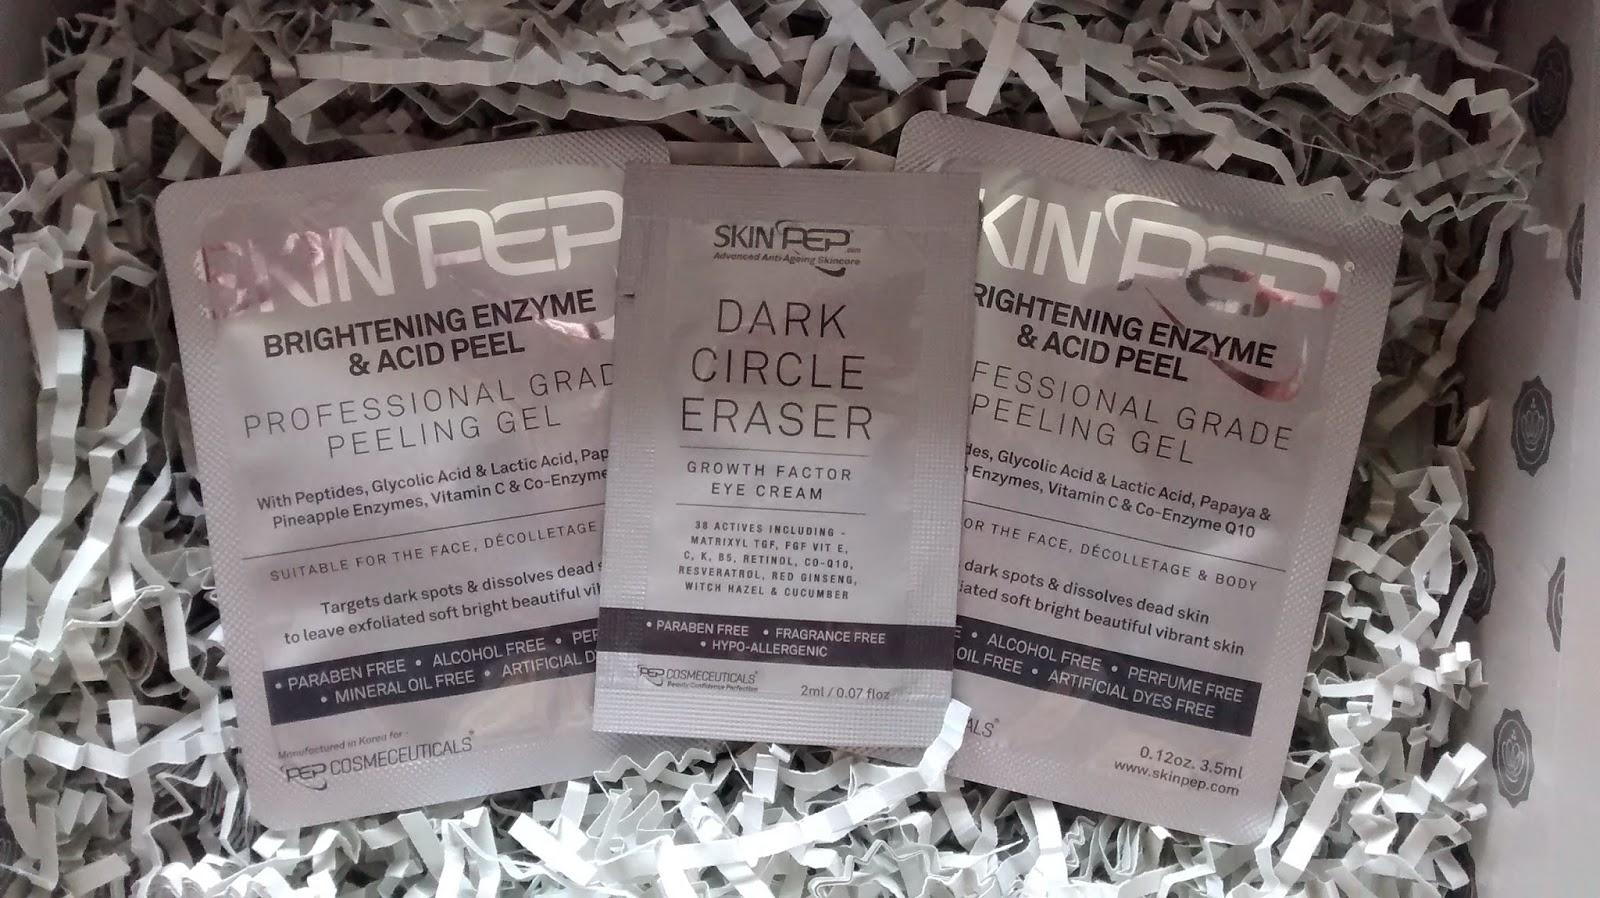 SkinPep Samples